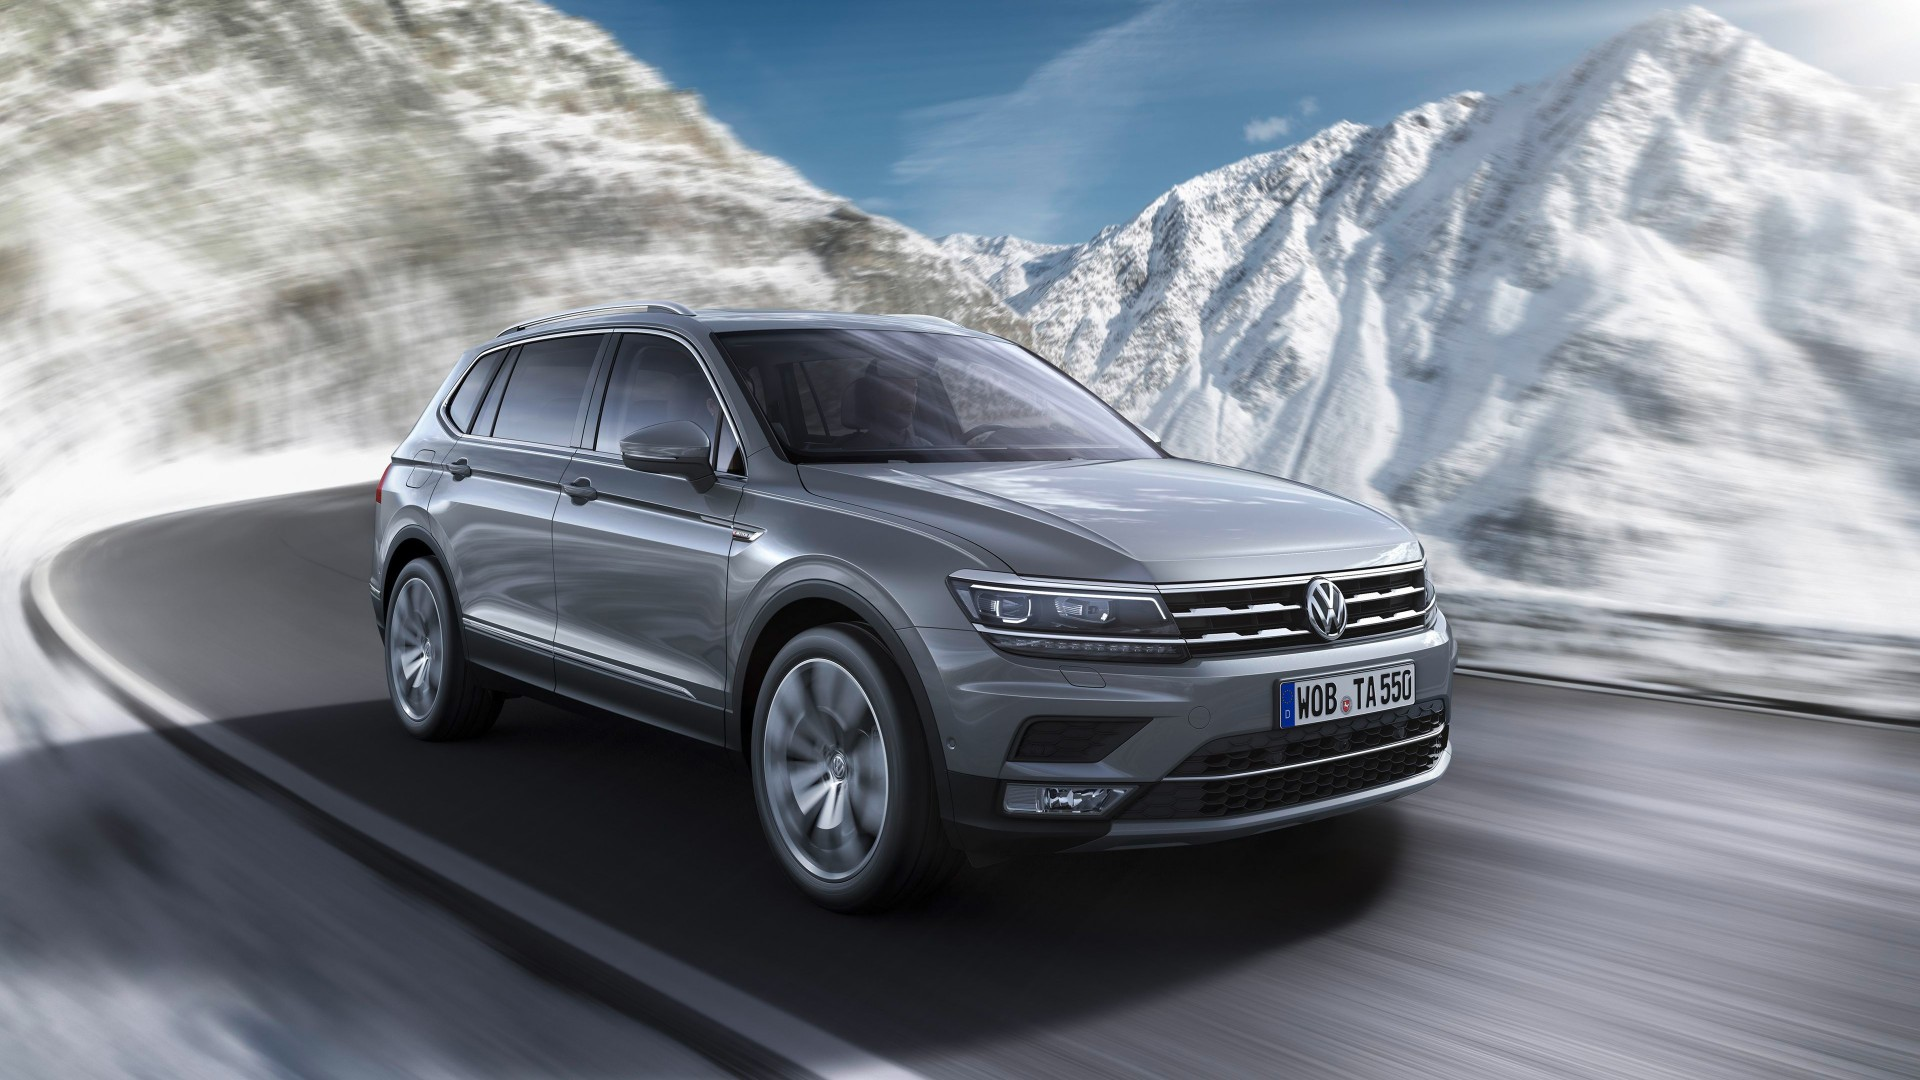 2018 Volkswagen Tiguan Allspace 4k Wallpaper Hd Car